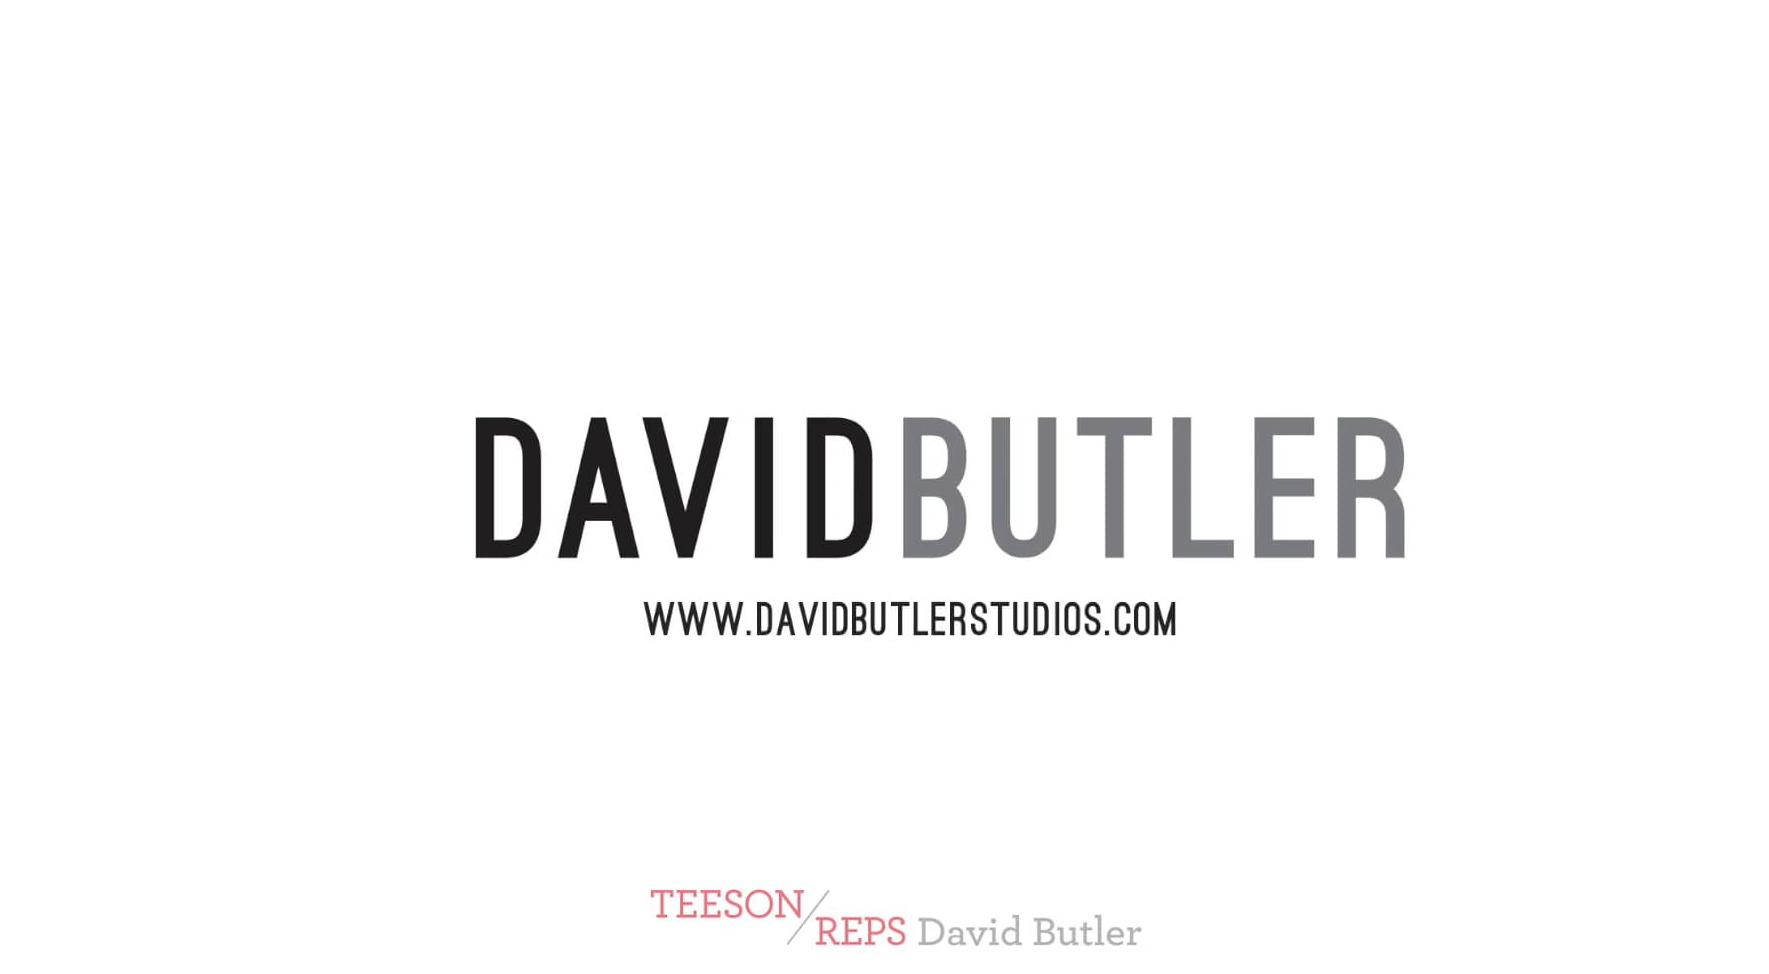 www.davidbutlerstudios.com   www.teesonreps.com